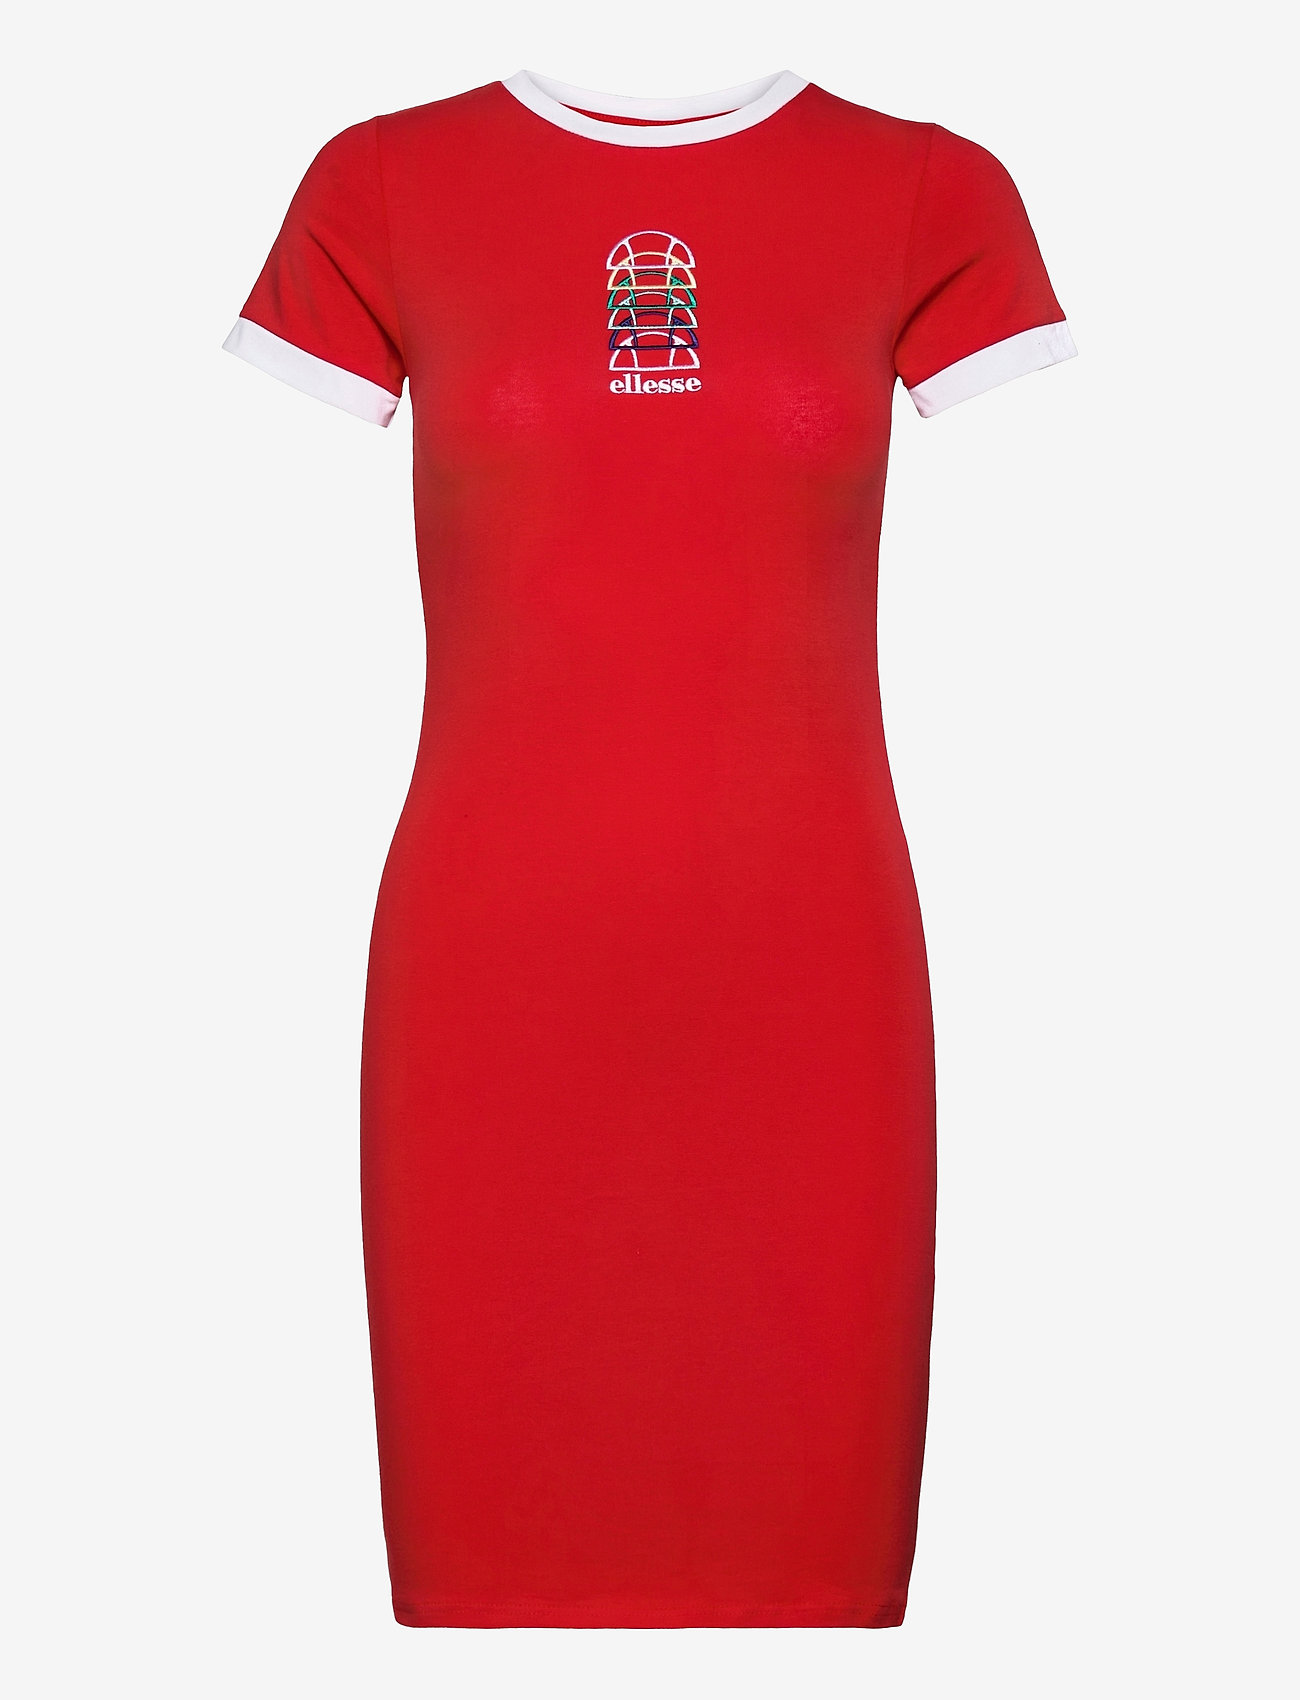 Ellesse - EL NINETTA DRESS - summer dresses - red - 0